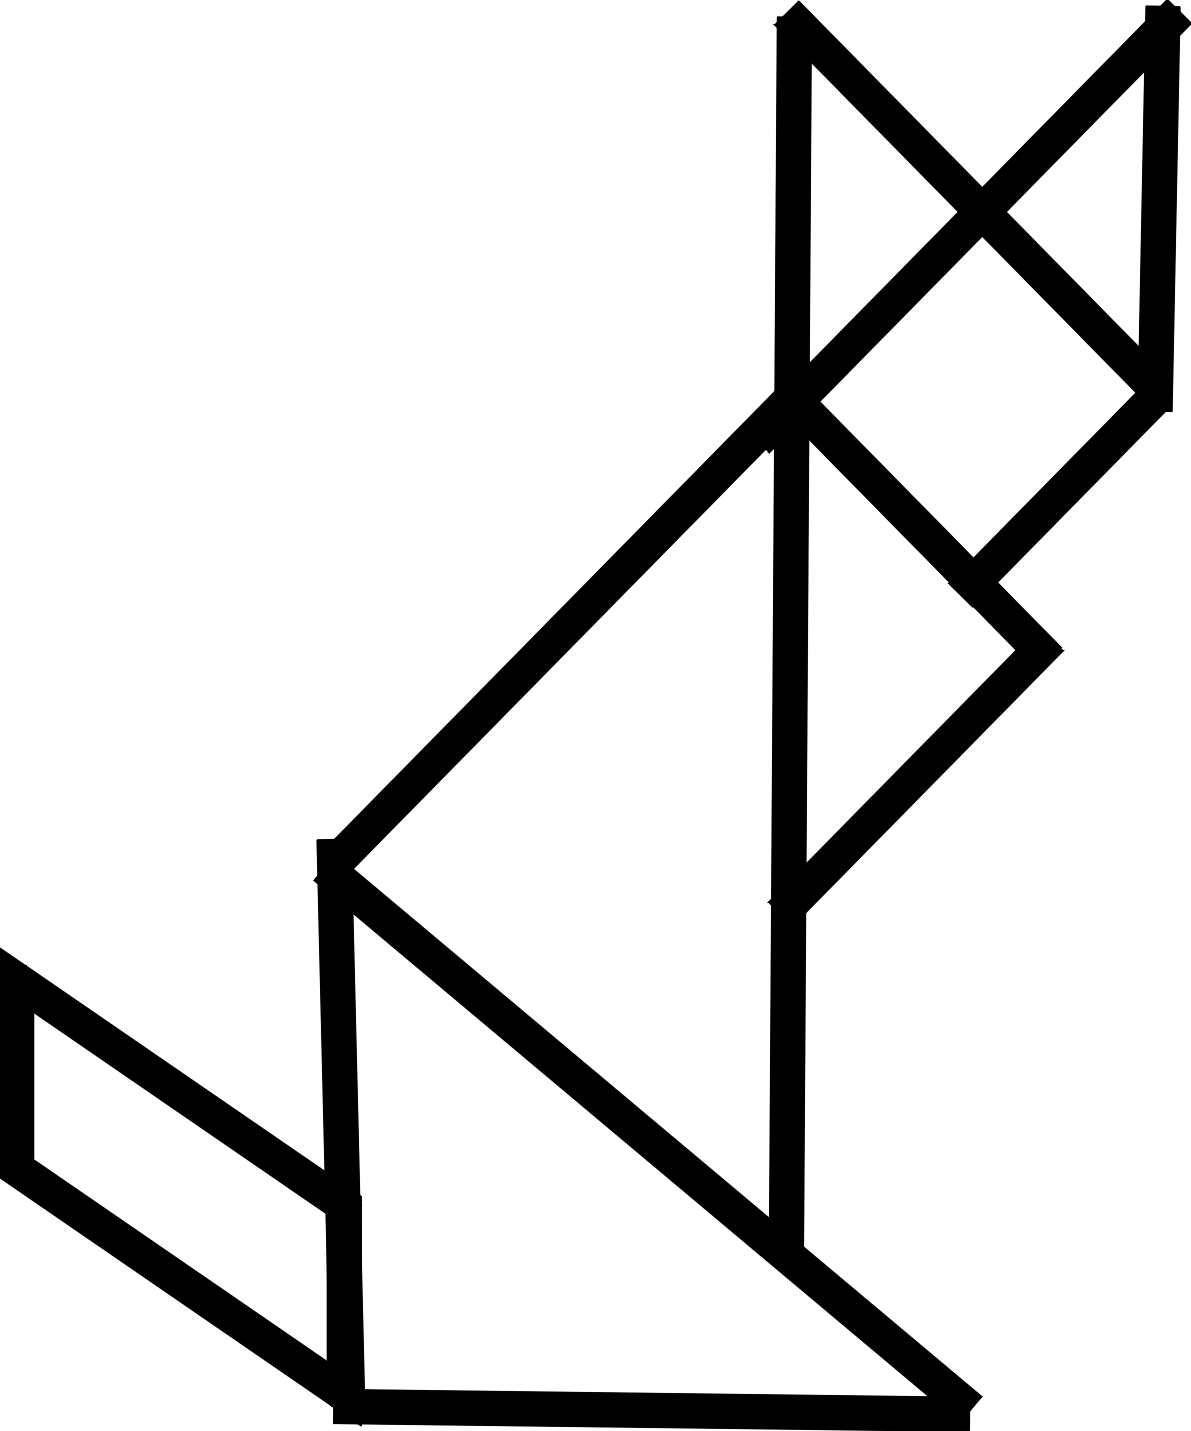 Tamgram Puzzles | Animaux Foret, Minou serapportantà Tangram Chat